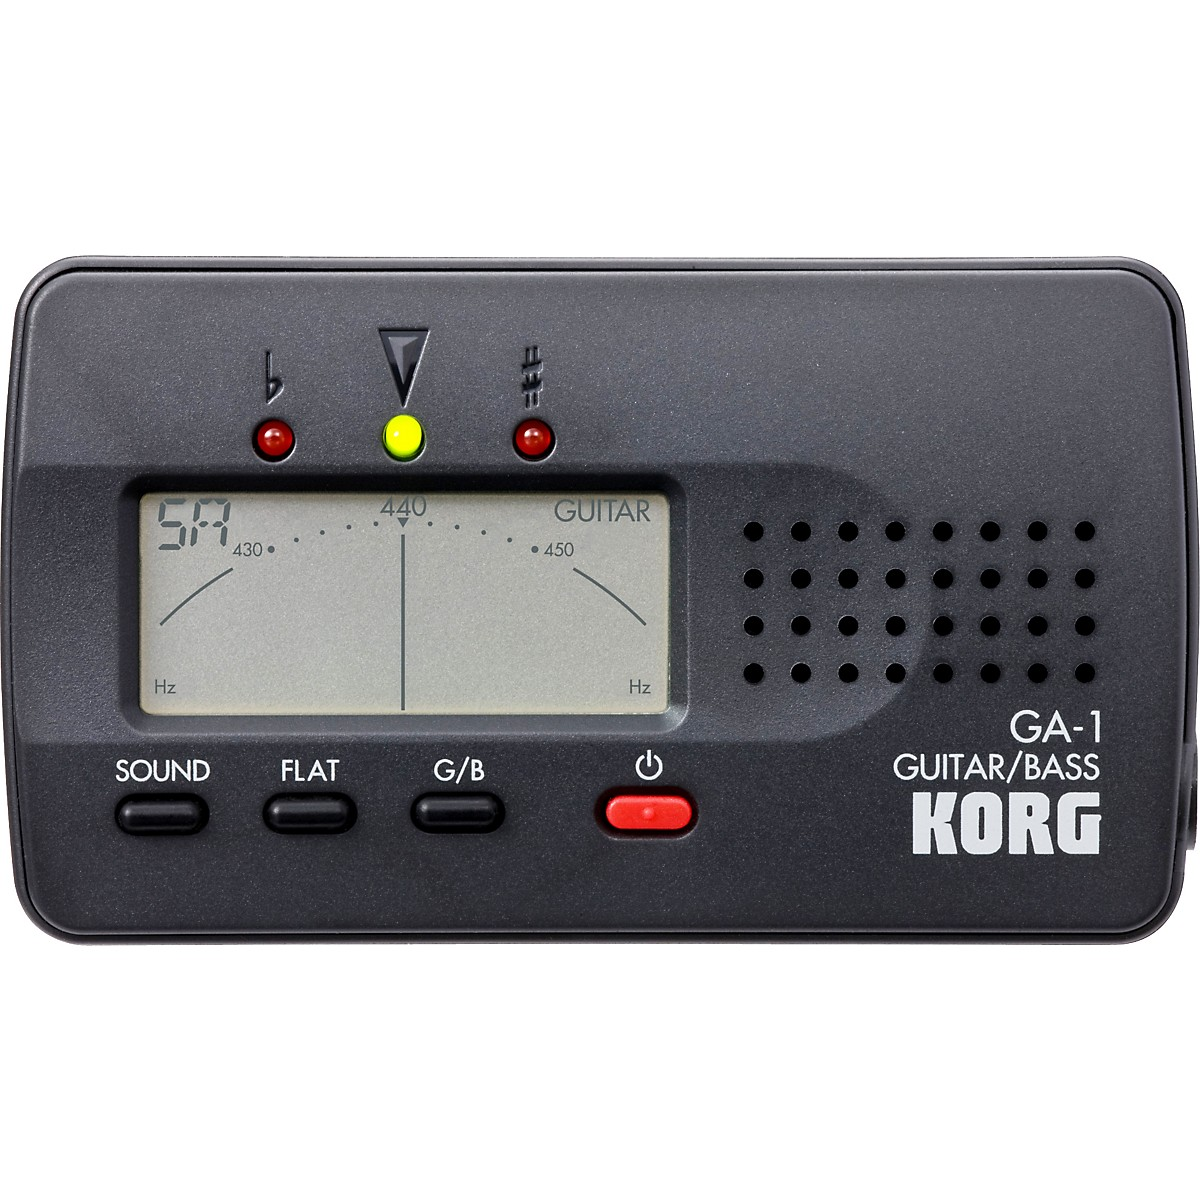 Korg GA-1 Guitar and Bass Tuner